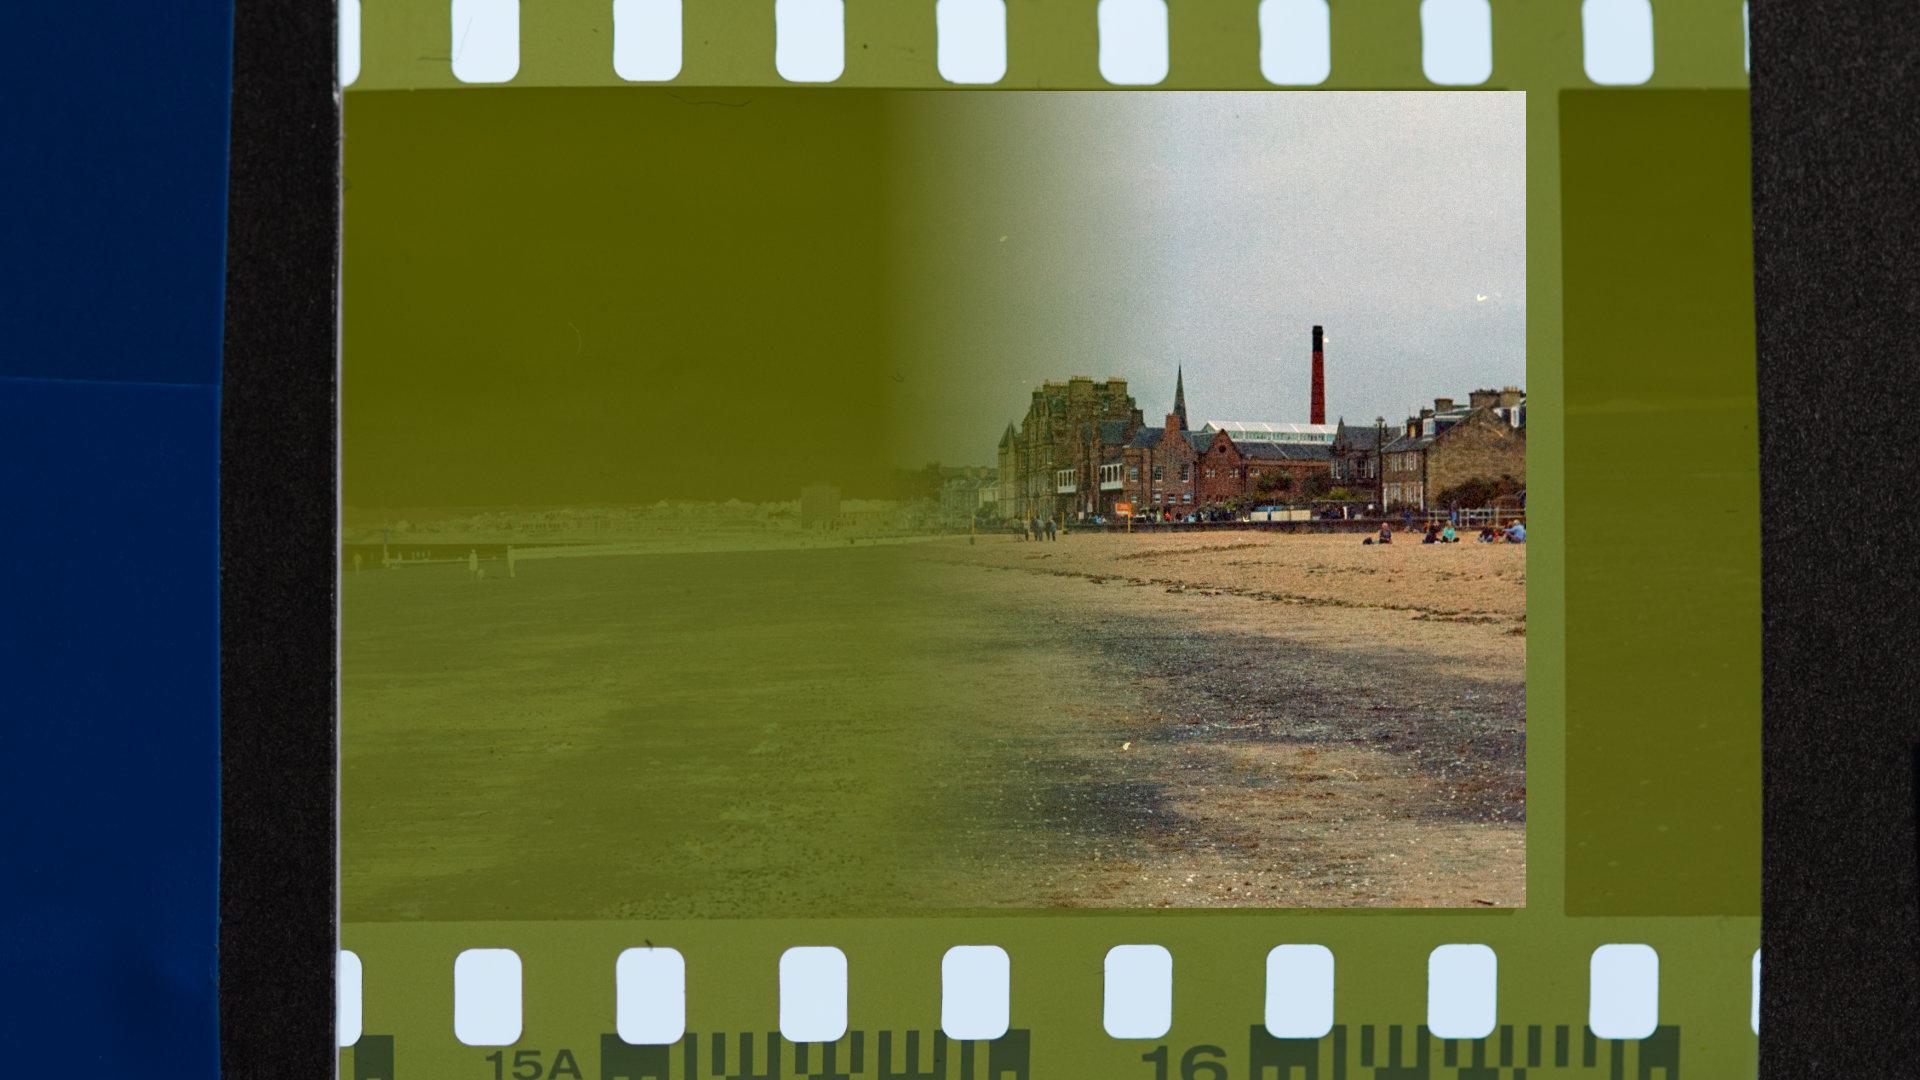 Lesson 4 - convert negative 35mm film